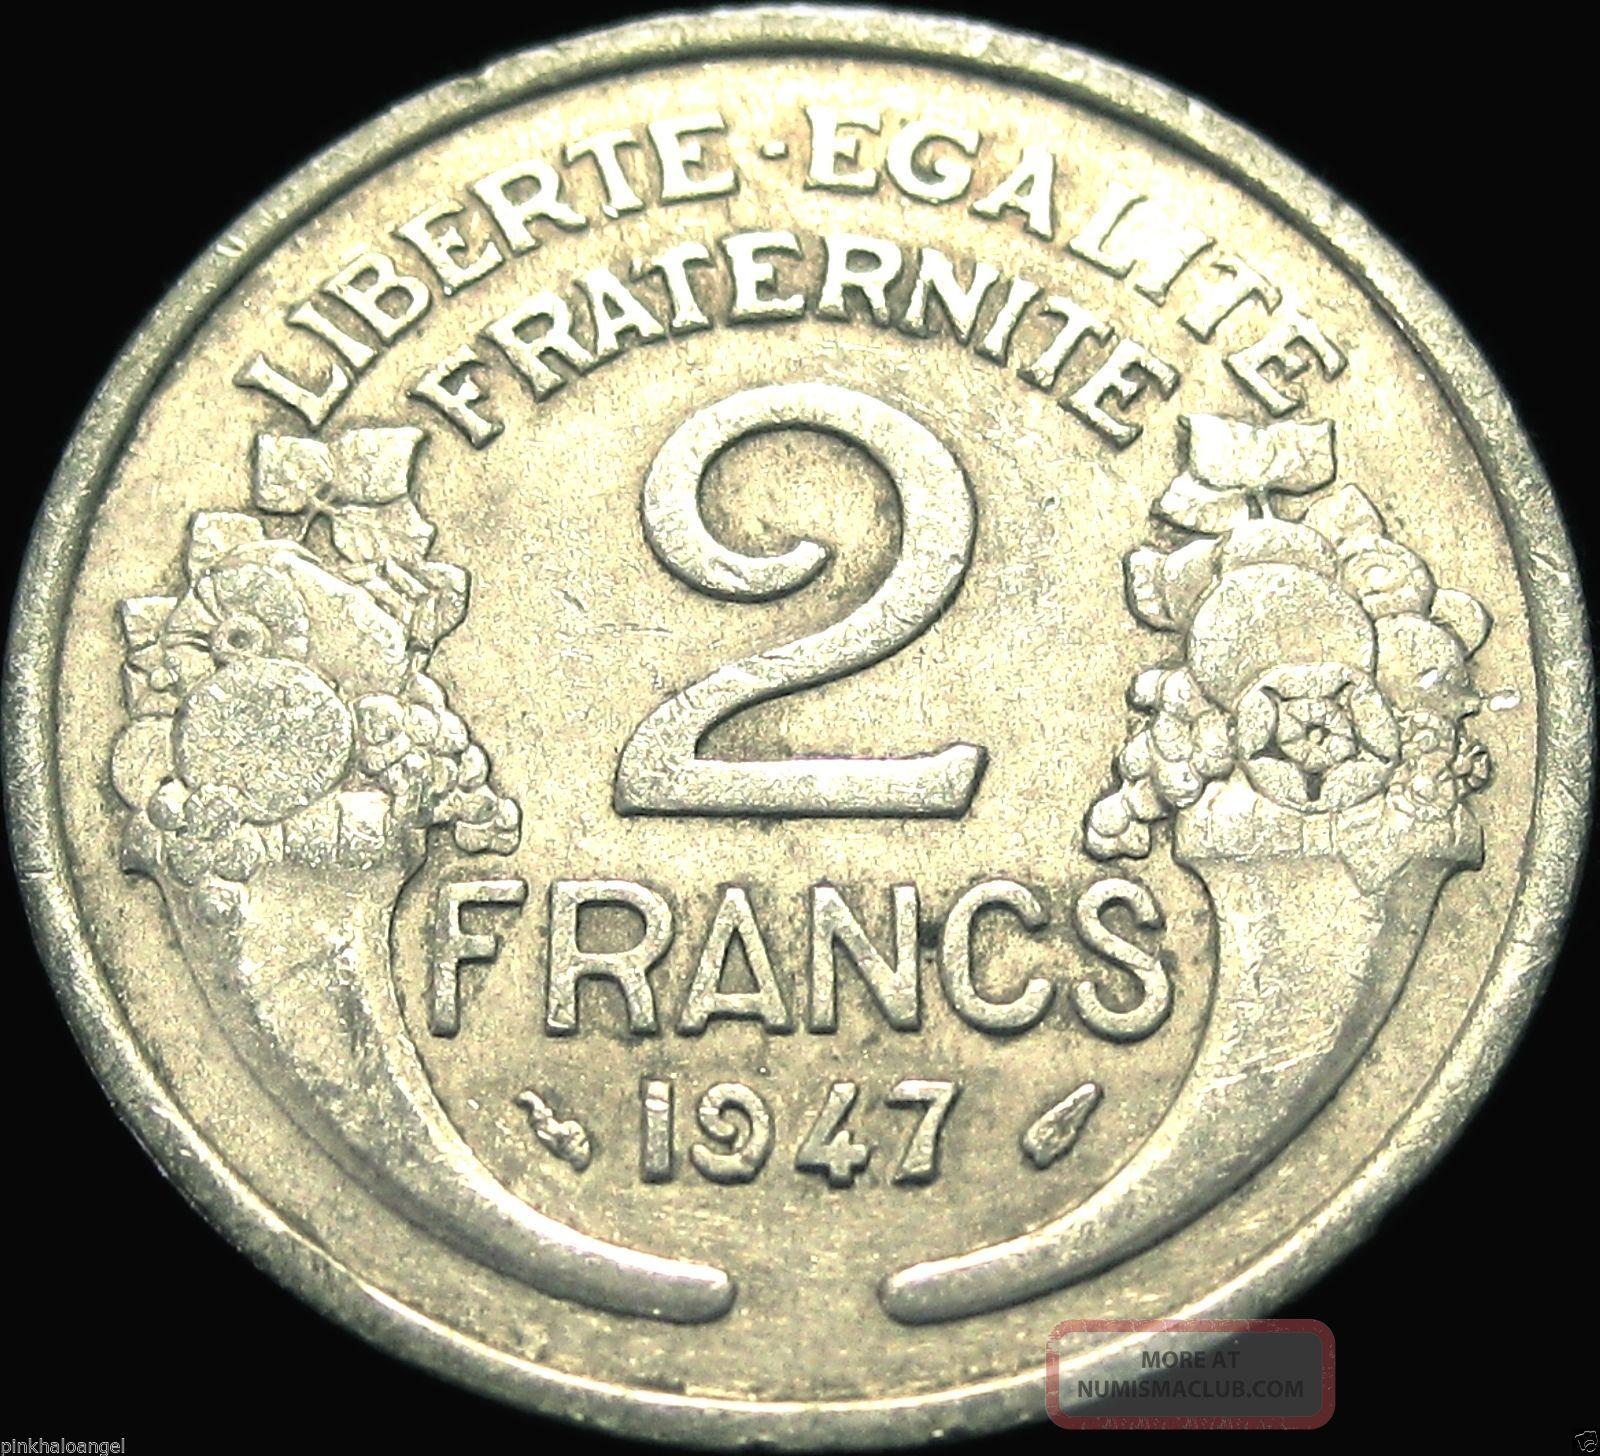 1947 2 francs coin